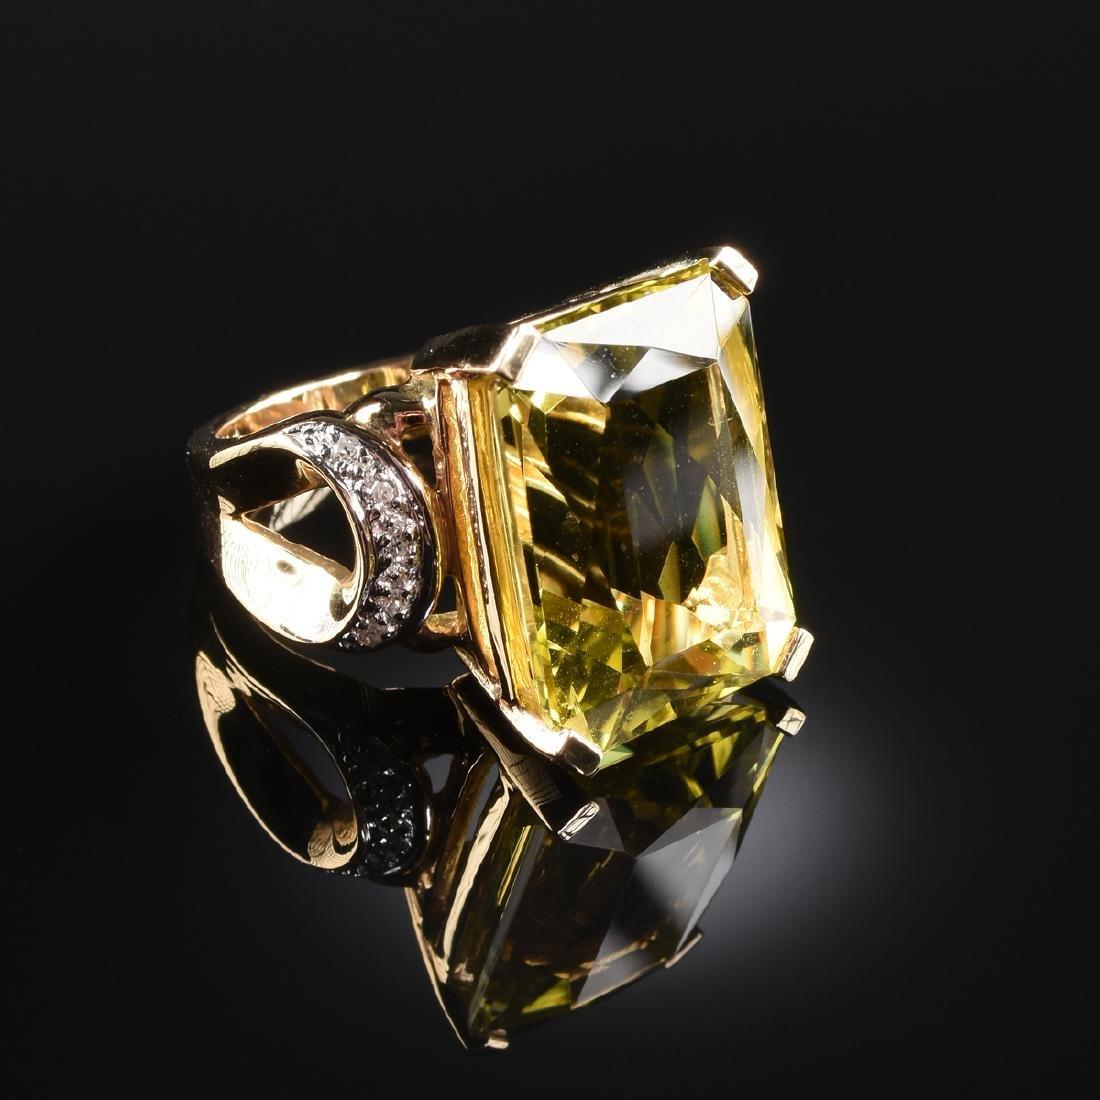 A 14K YELLOW GOLD, DIAMOND, AND YELLOW SAPPHIRE LAURA